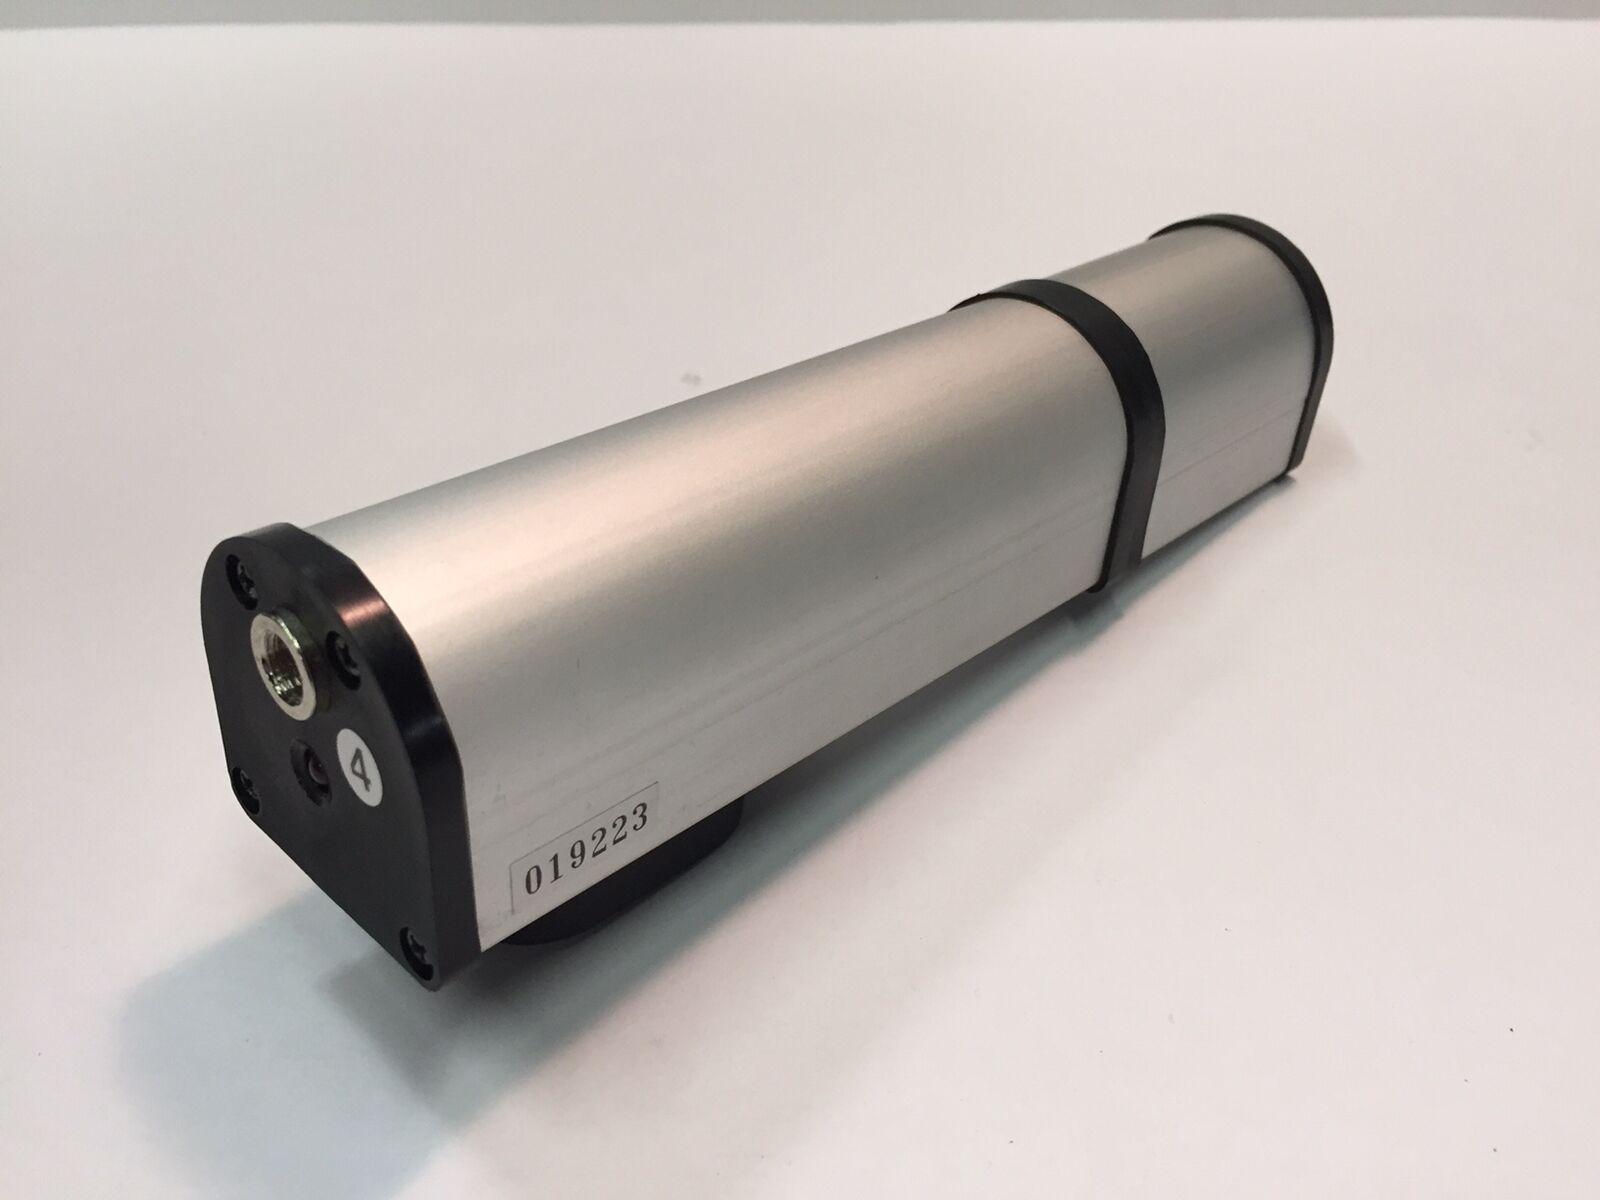 prima qualità ai consumatori DT Systems Model-300 DT Transmitter unit unit unit and NiCad battery pack, Push Button  alta qualità generale